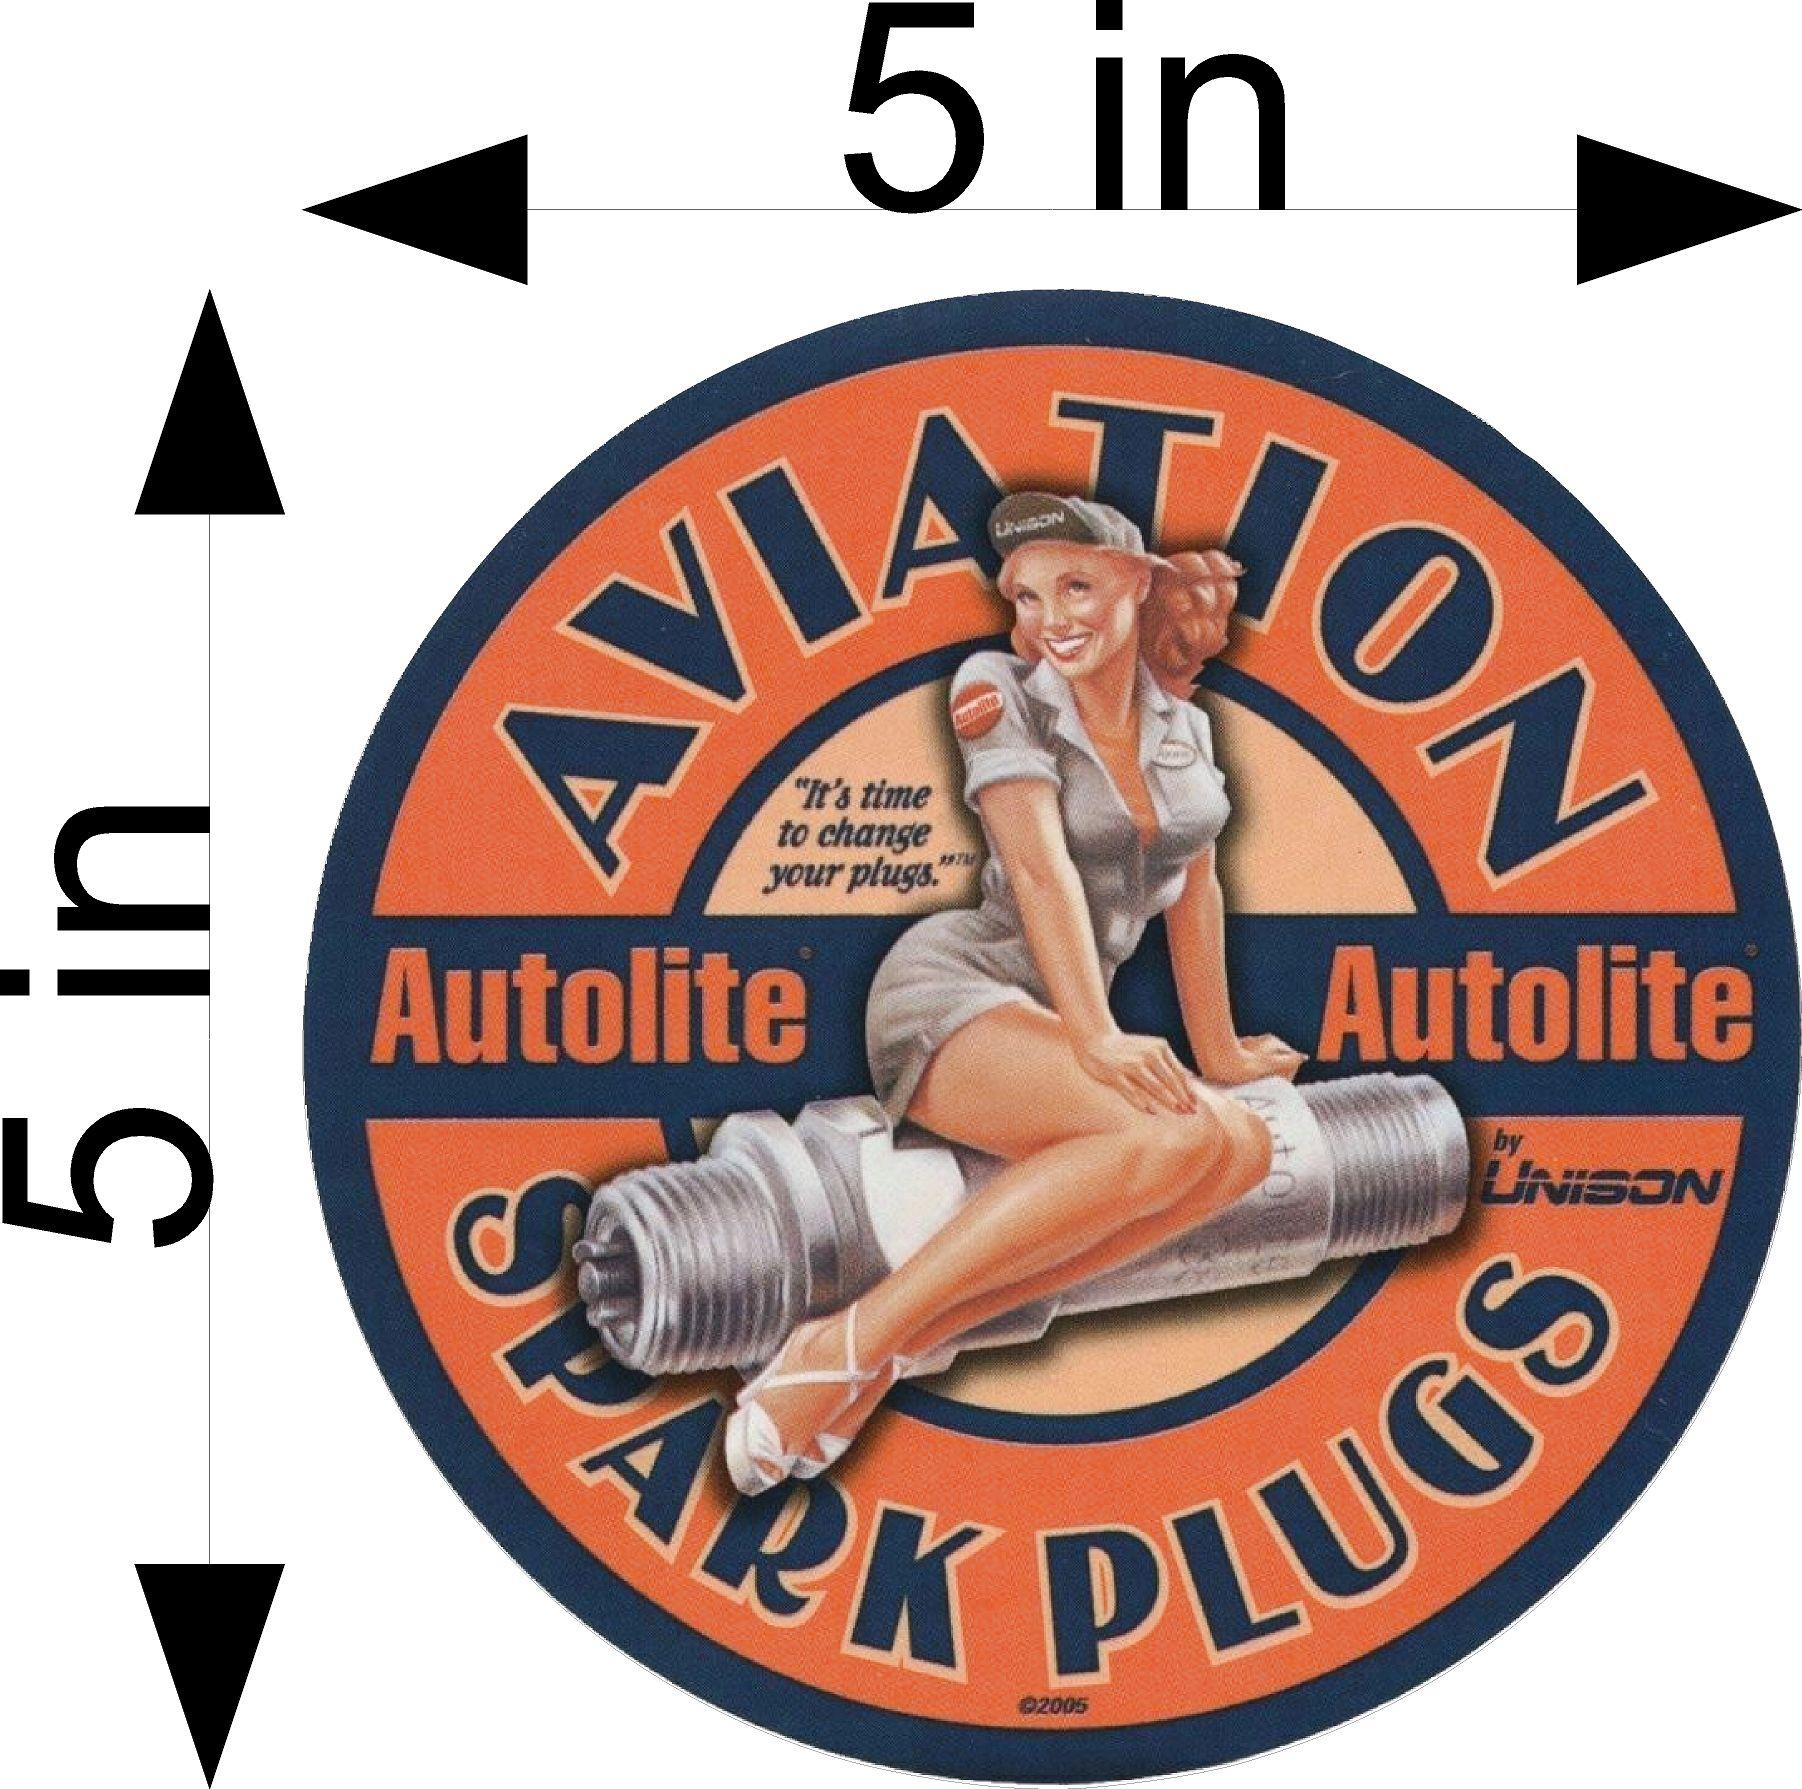 Aviation Spark Plug Pin up Sticker